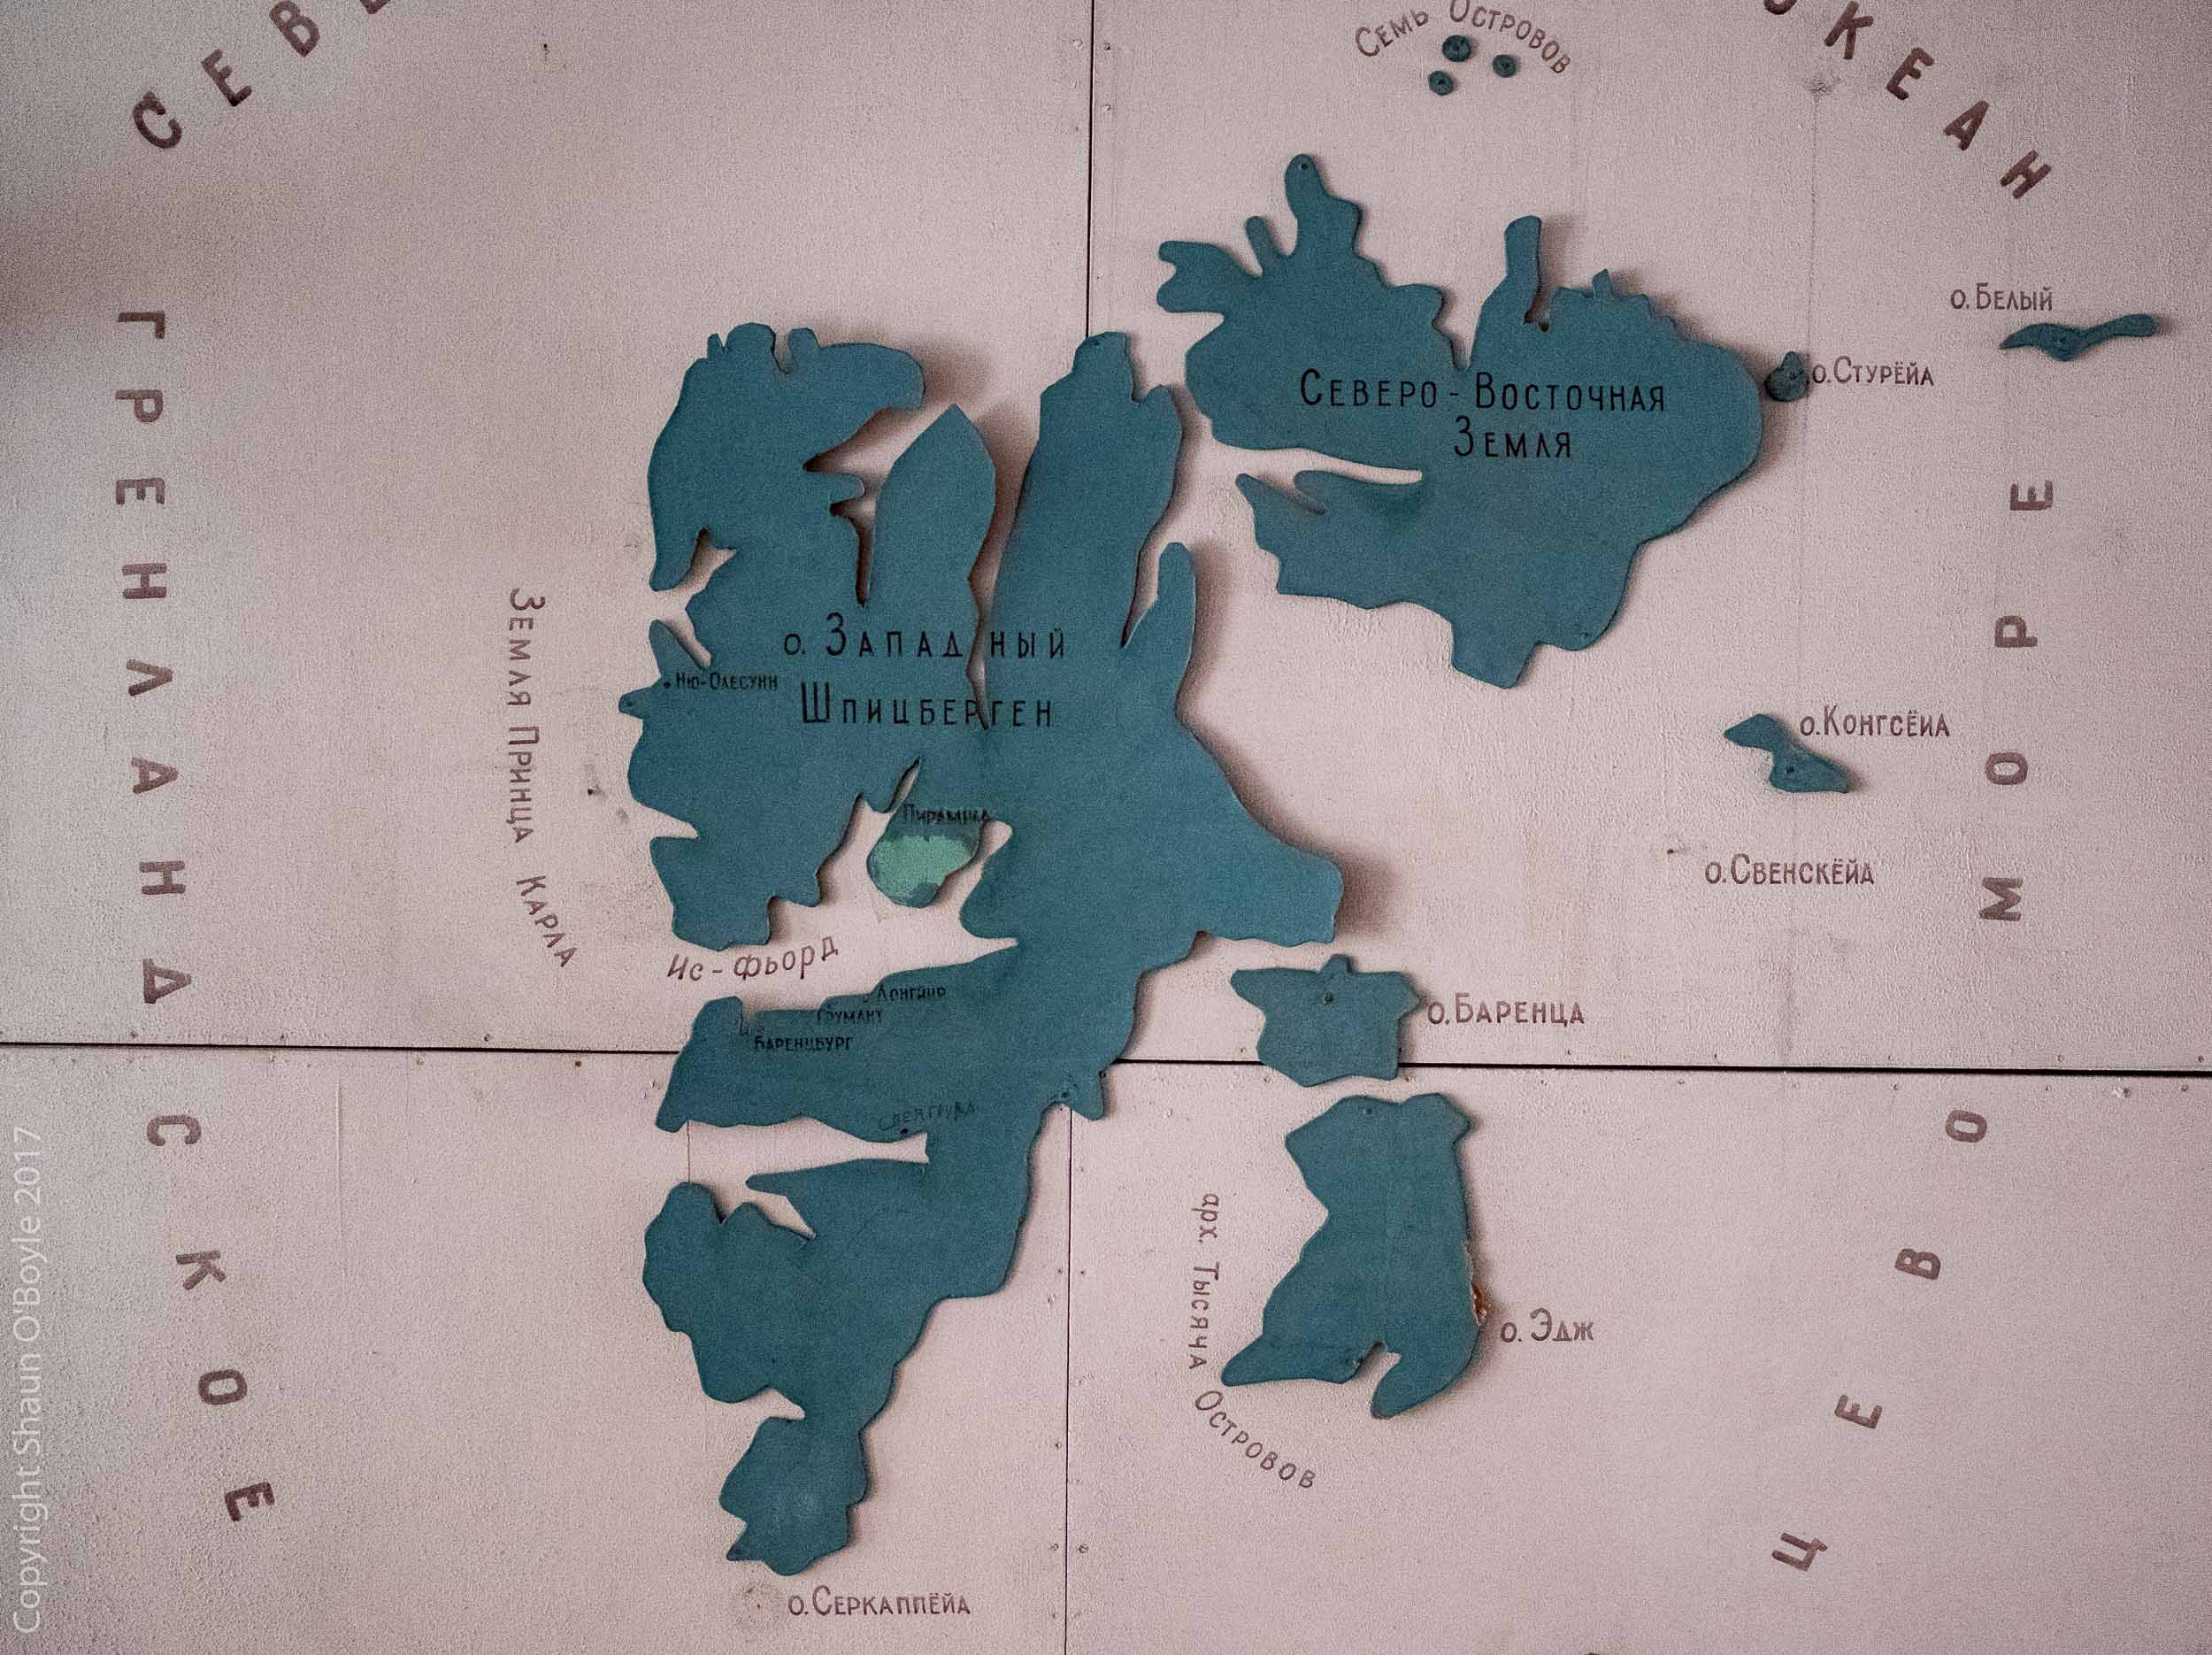 Map of Svalbard Archipelago, Pyramiden, Svalbard